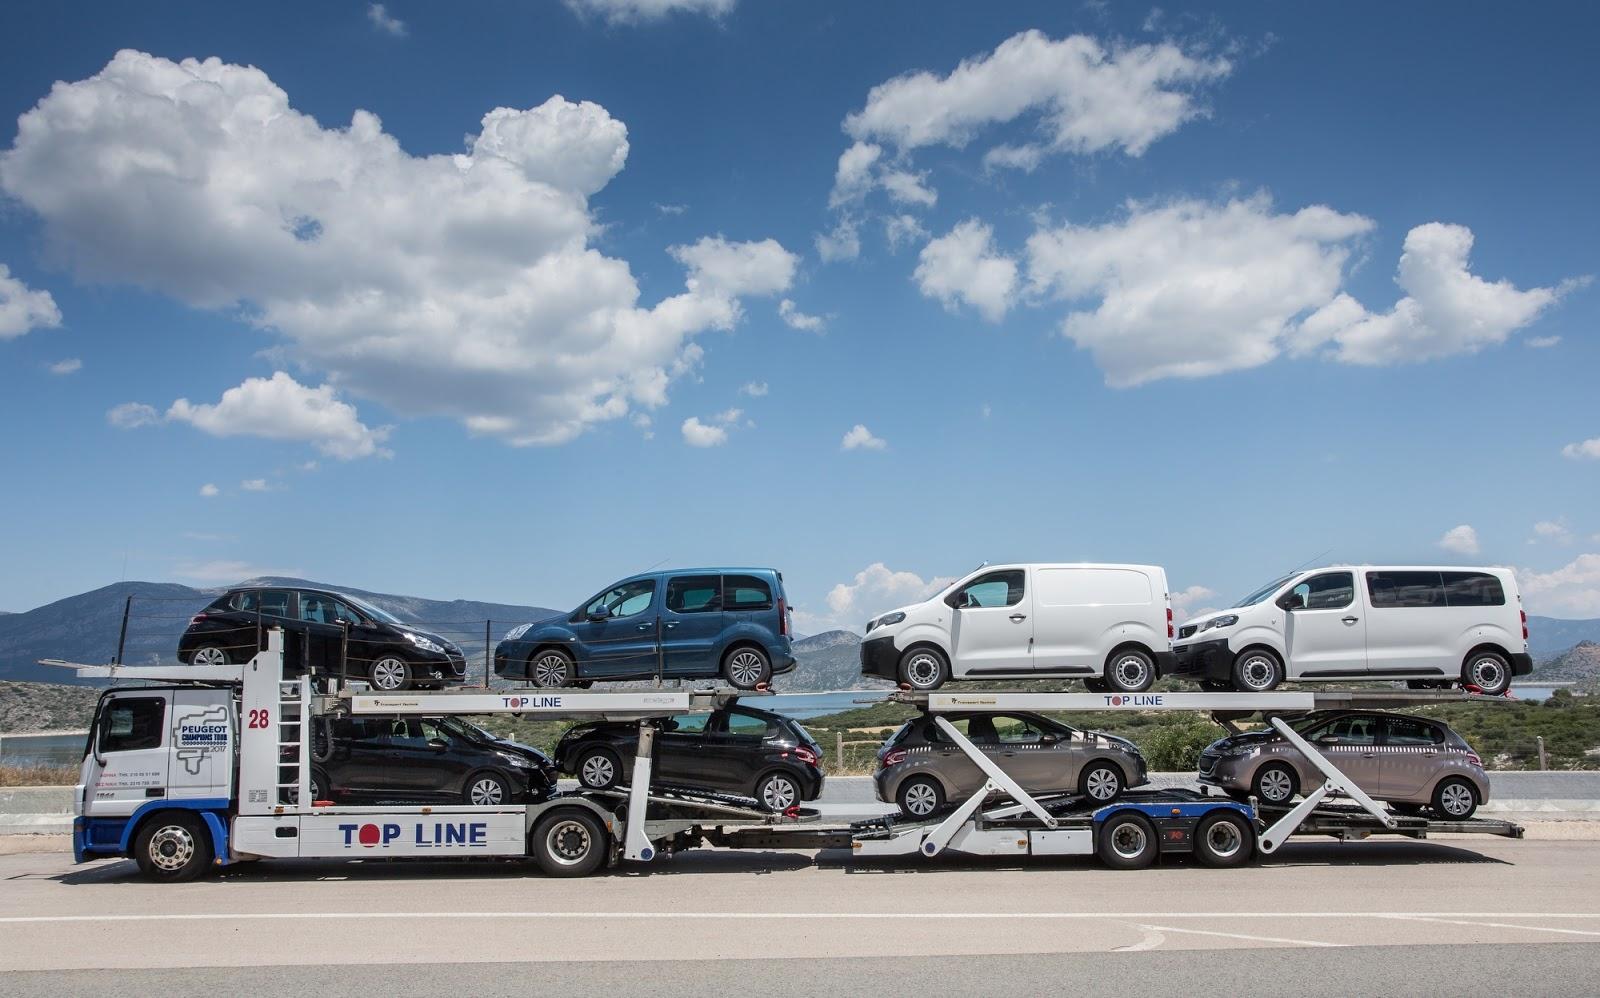 PHOTO2B2 Τα Peugeot έρχονται στην πόρτα σου για να τα οδηγήσεις! Peugeot, αυτοκίνητα, καινούργιο, καινούρια, καινούριο, μεταχειρισμένα, μεταχειρισμένο